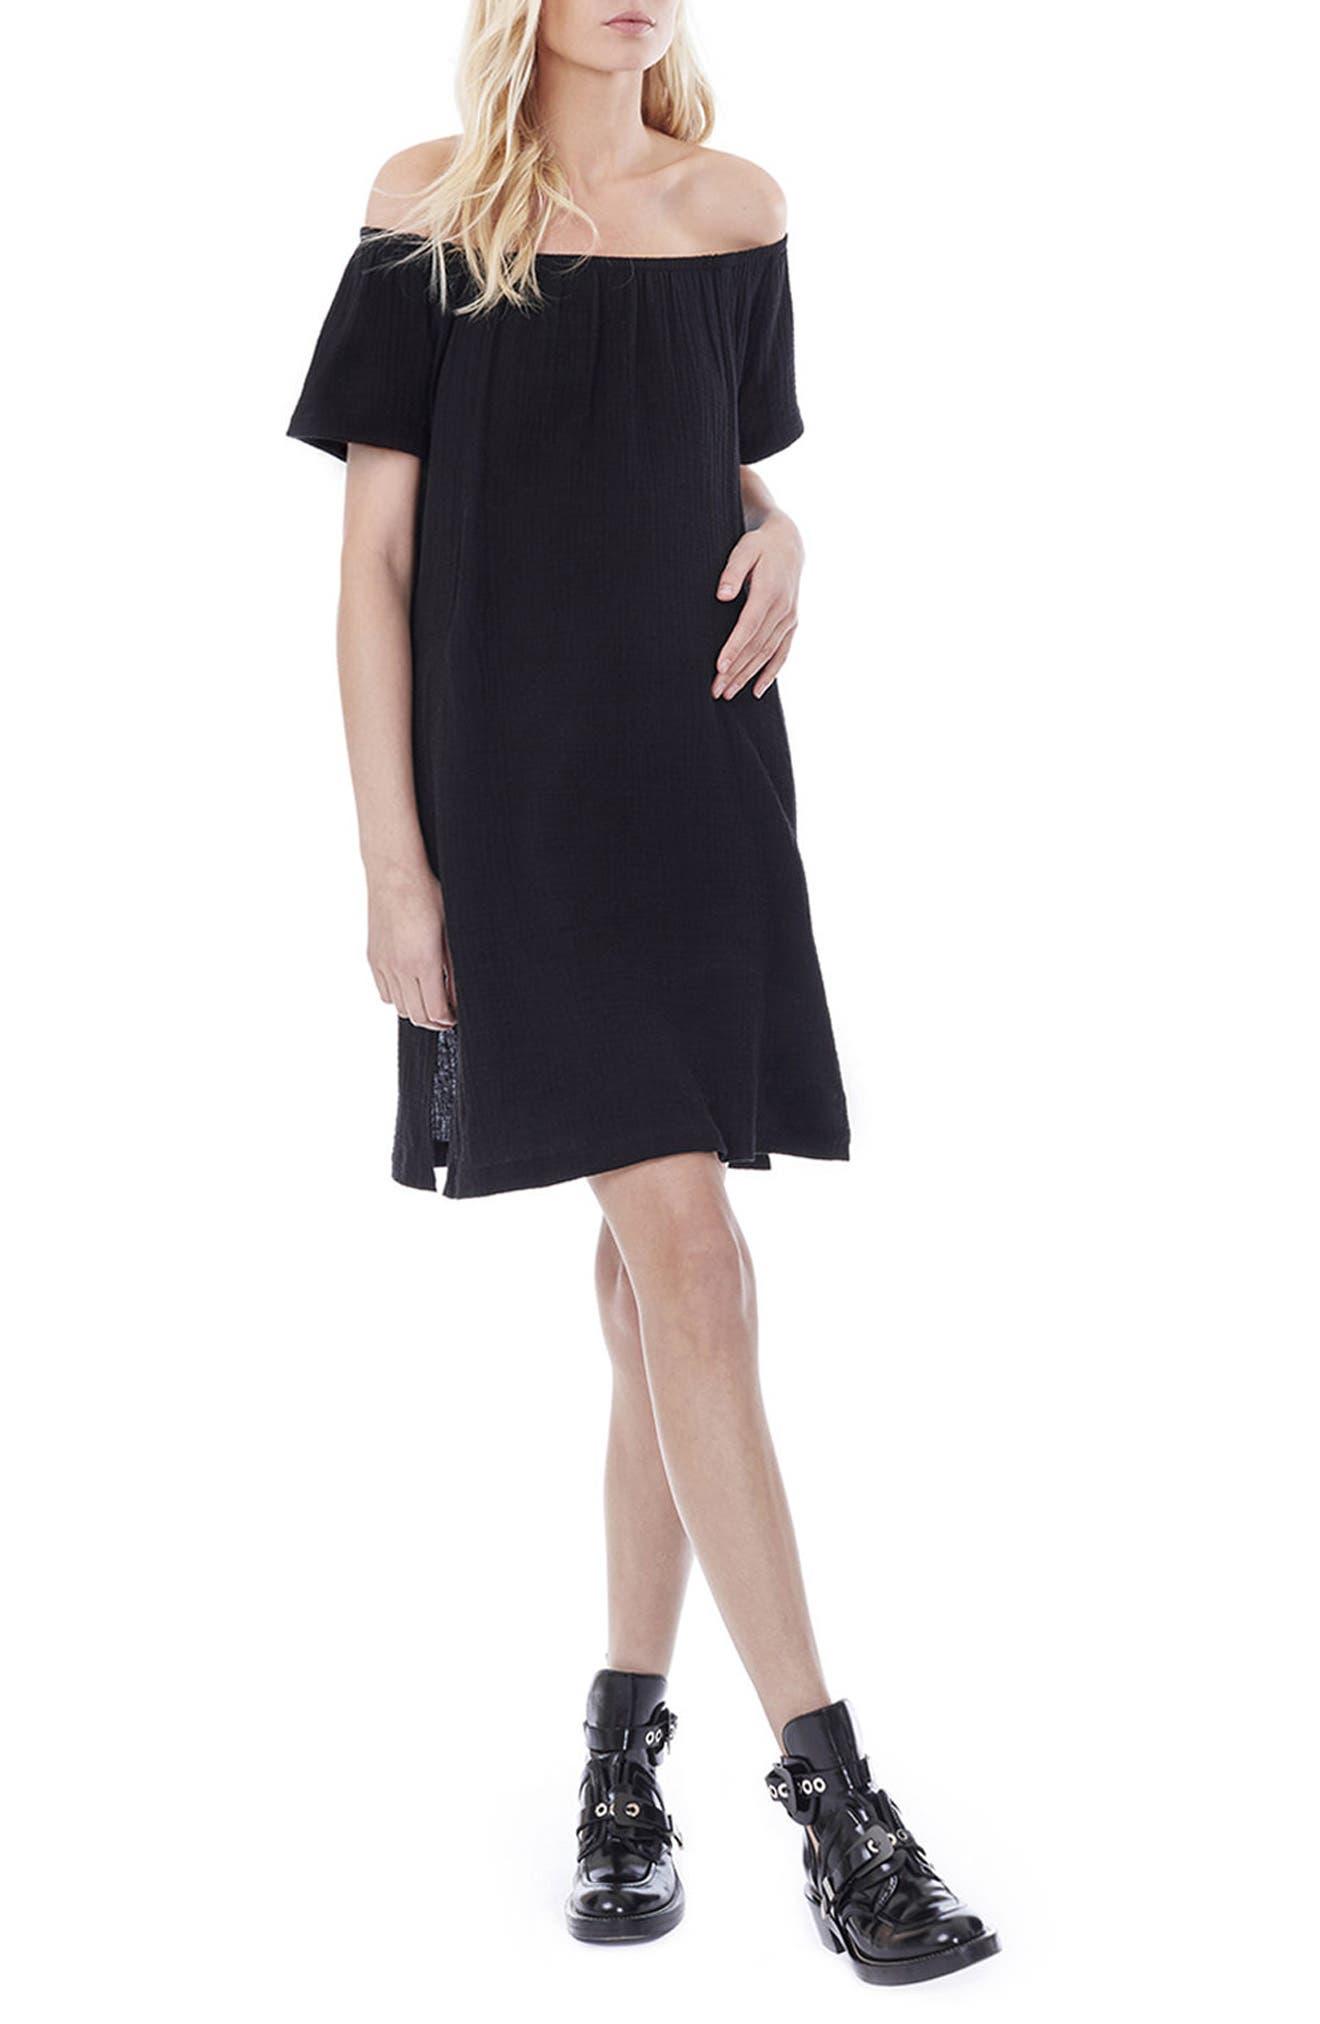 LOYAL HANA Ariel Off The Shoulder Maternity/Nursing Dress, Main, color, BLACK